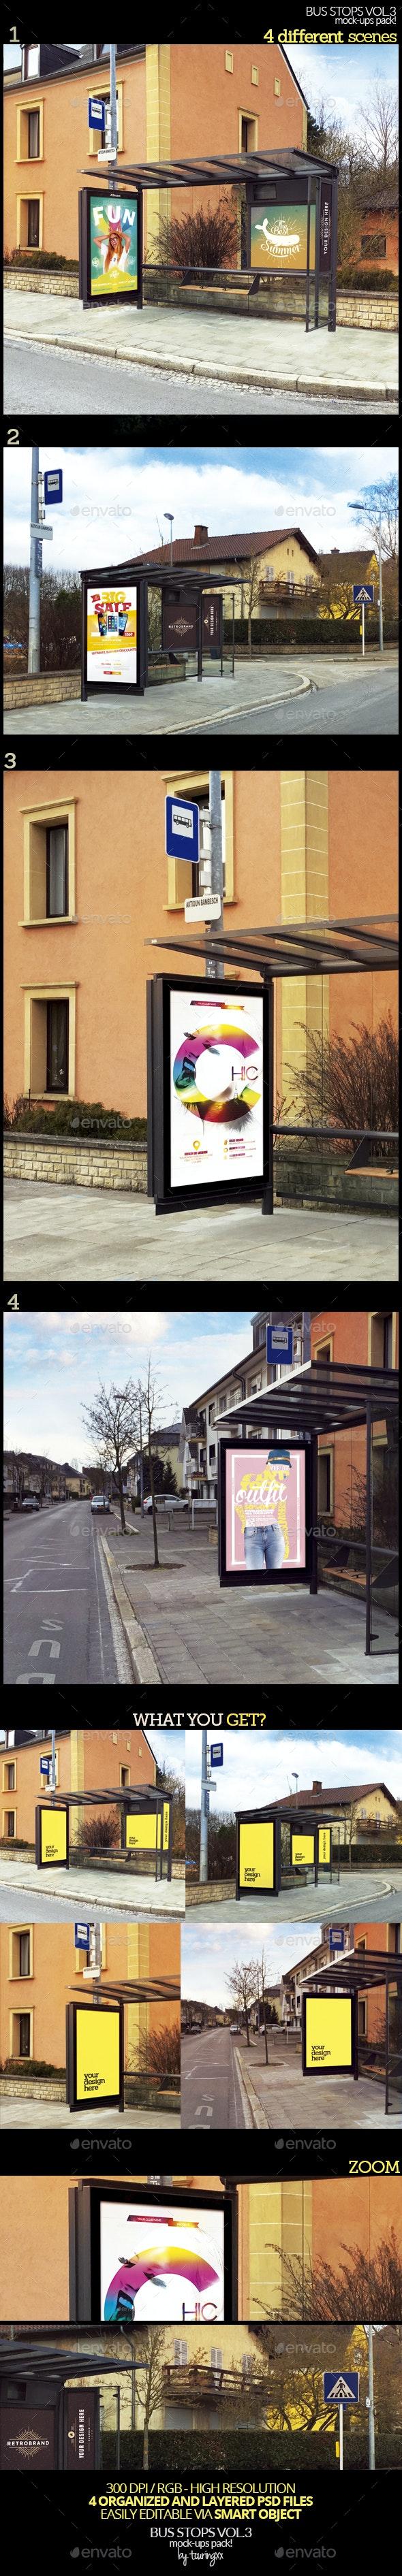 Bus Stops Vol.3 Mock-Ups Pack - Product Mock-Ups Graphics